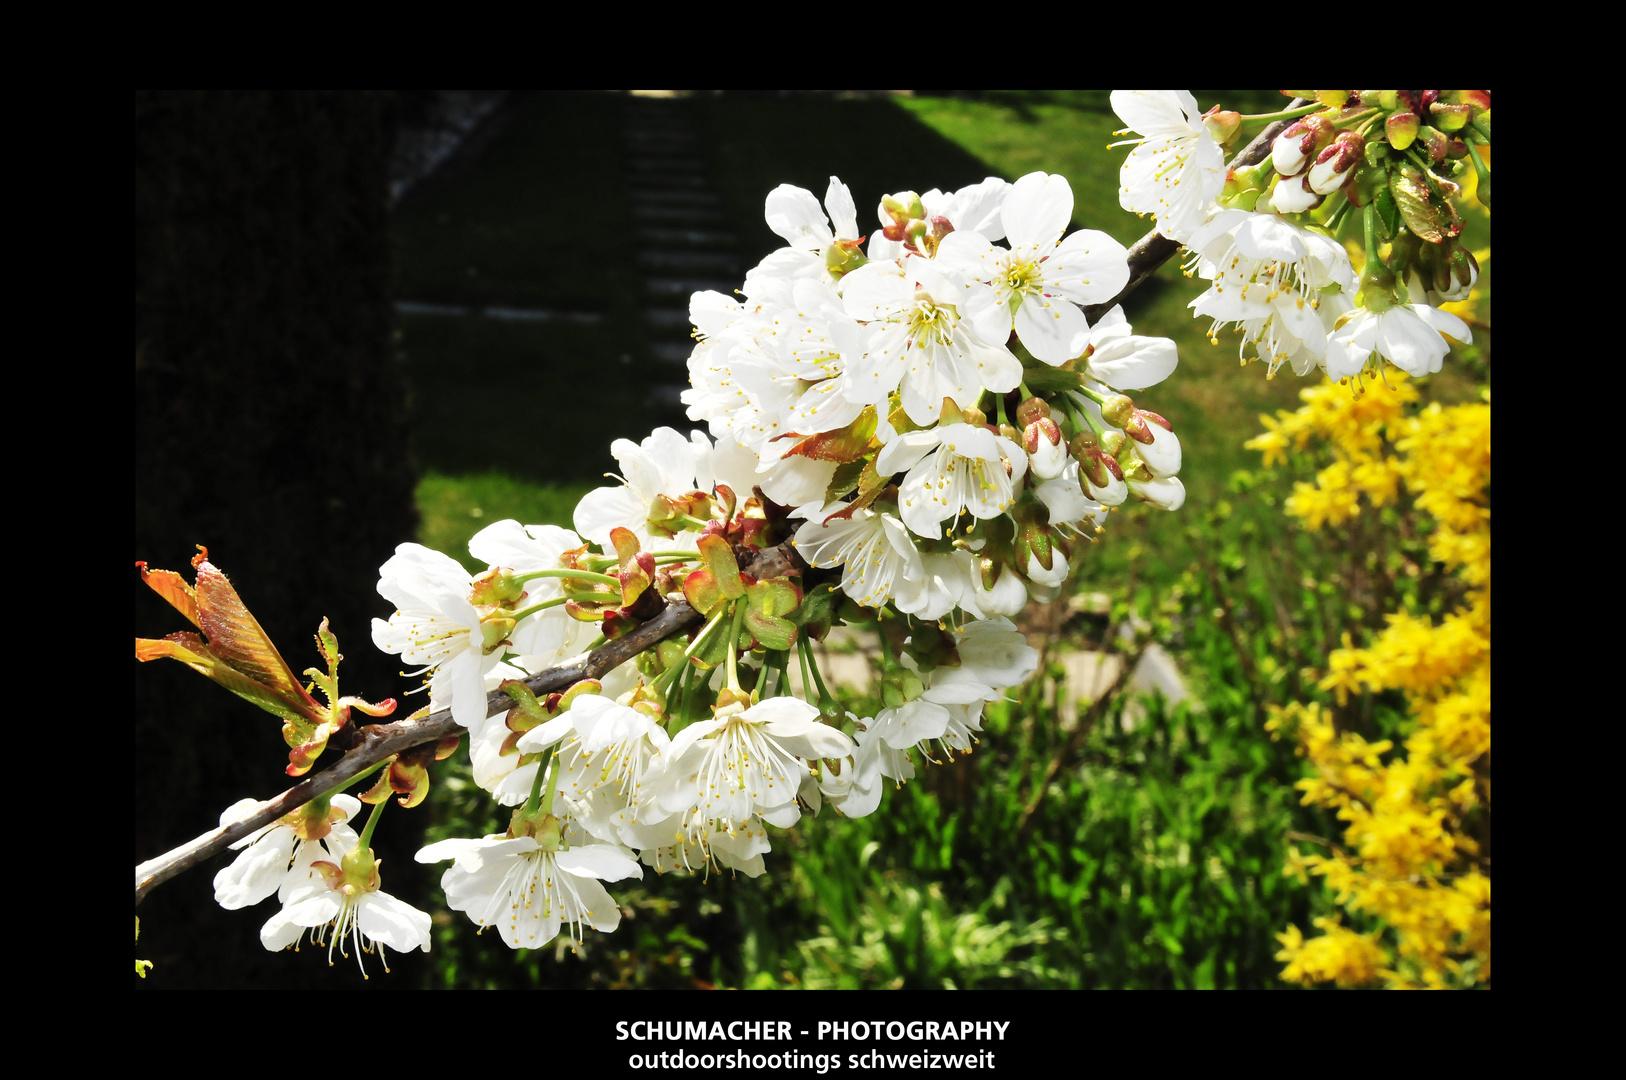 farben pracht im fr hling am kirschbaum foto bild pflanzen pilze flechten b ume. Black Bedroom Furniture Sets. Home Design Ideas